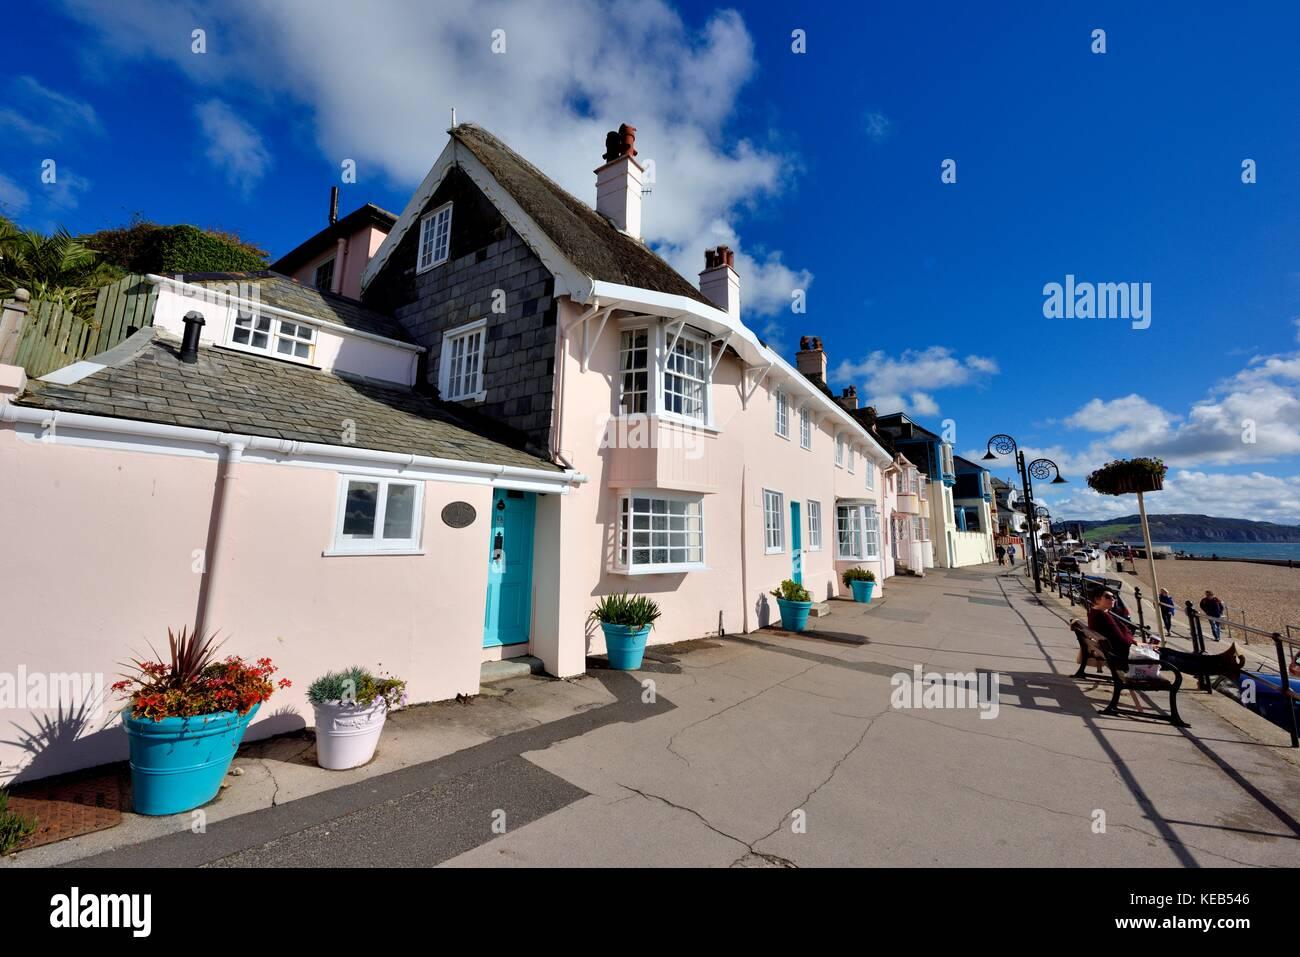 Swell Seaside Holiday Cottages Lyme Regis Dorset England Uk Stock Home Remodeling Inspirations Genioncuboardxyz